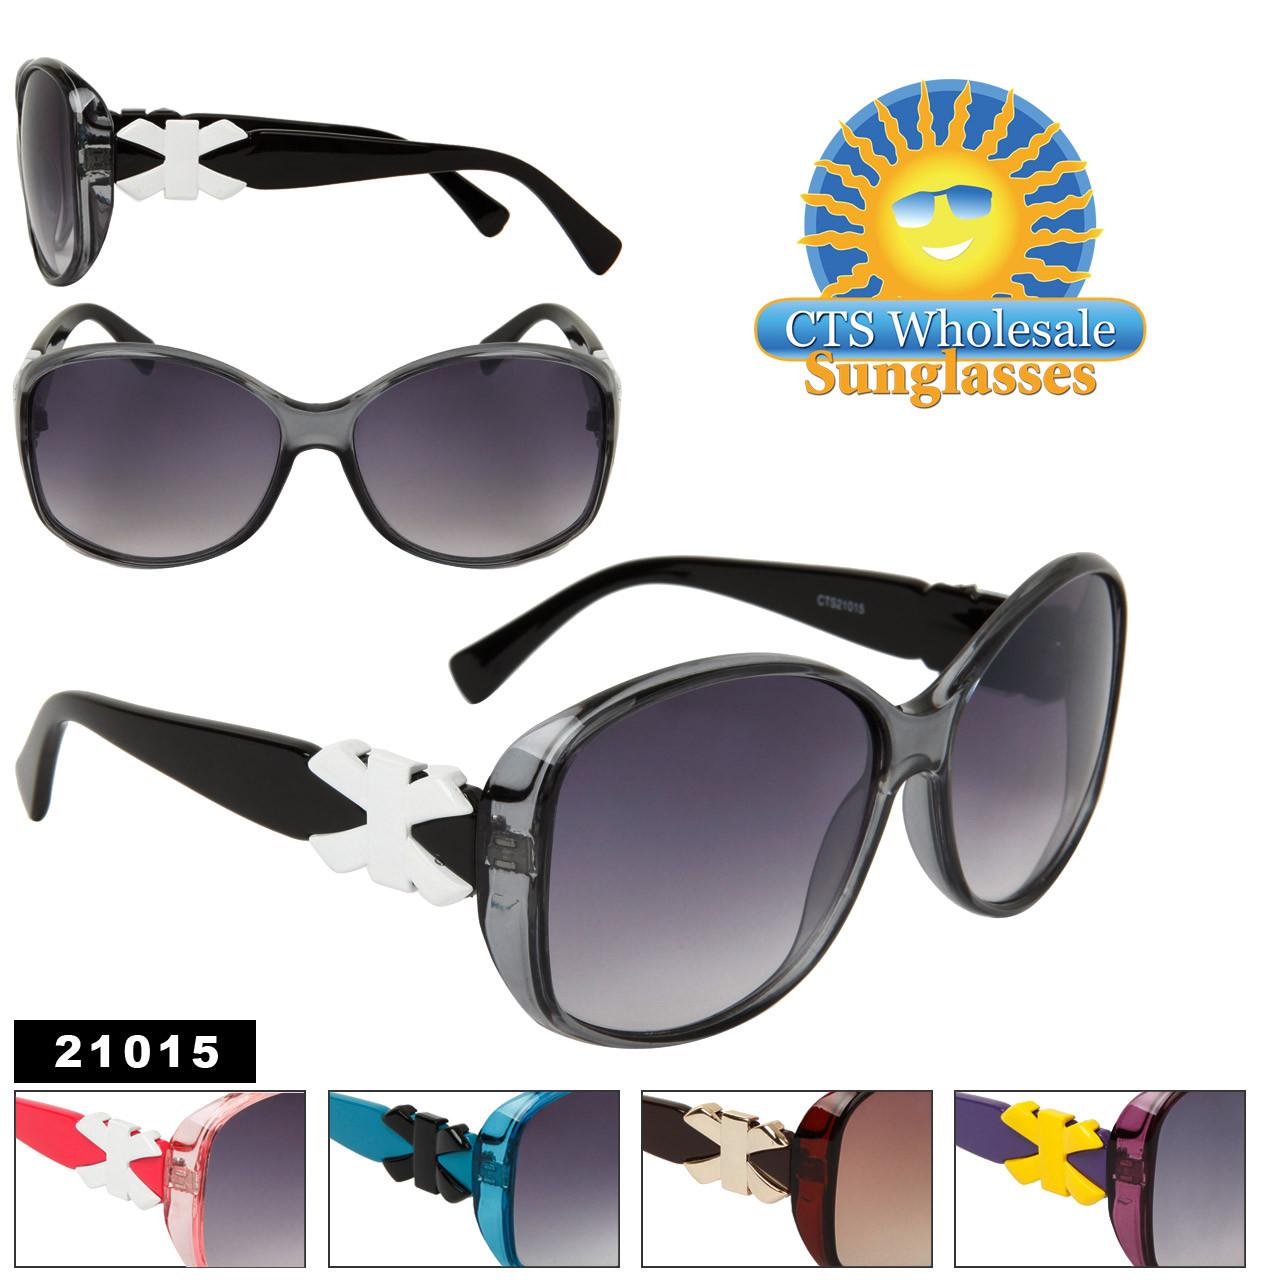 Women's Fashion Sunglasses Wholesale 21015